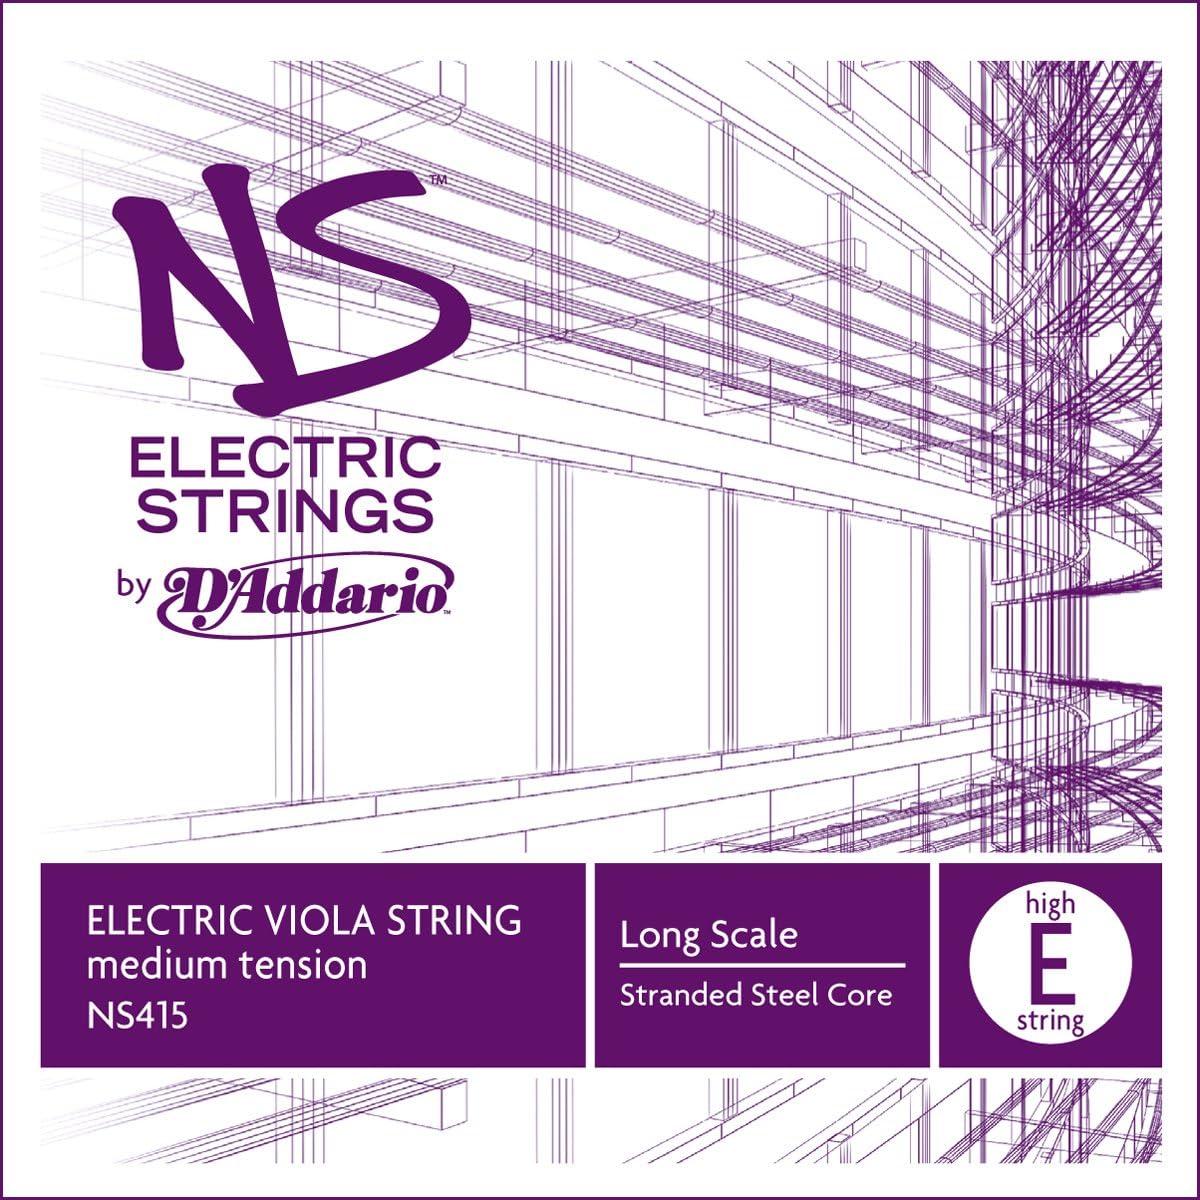 Extra-Extra-Short Scale DAddario Ascent/é Viola D String Medium Tension